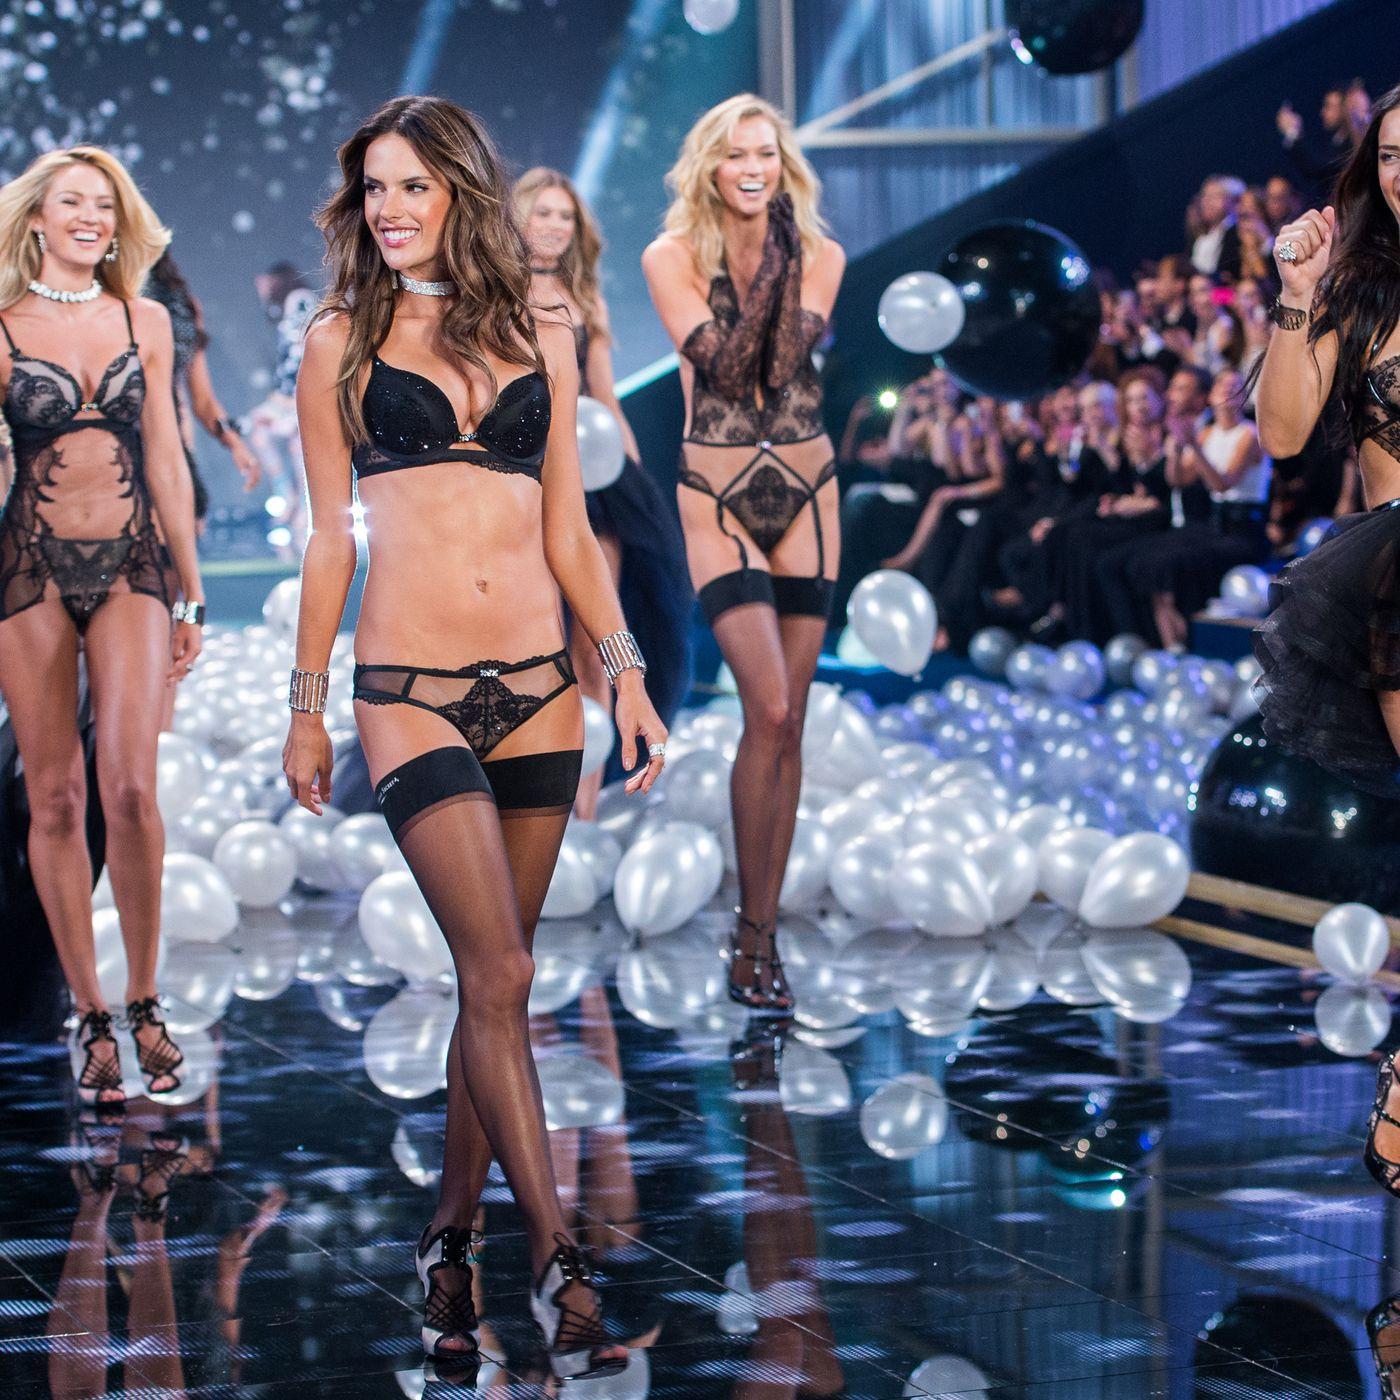 df3cea0c1d5 Victoria's Secret fashion show 2018: history and controversies - Vox